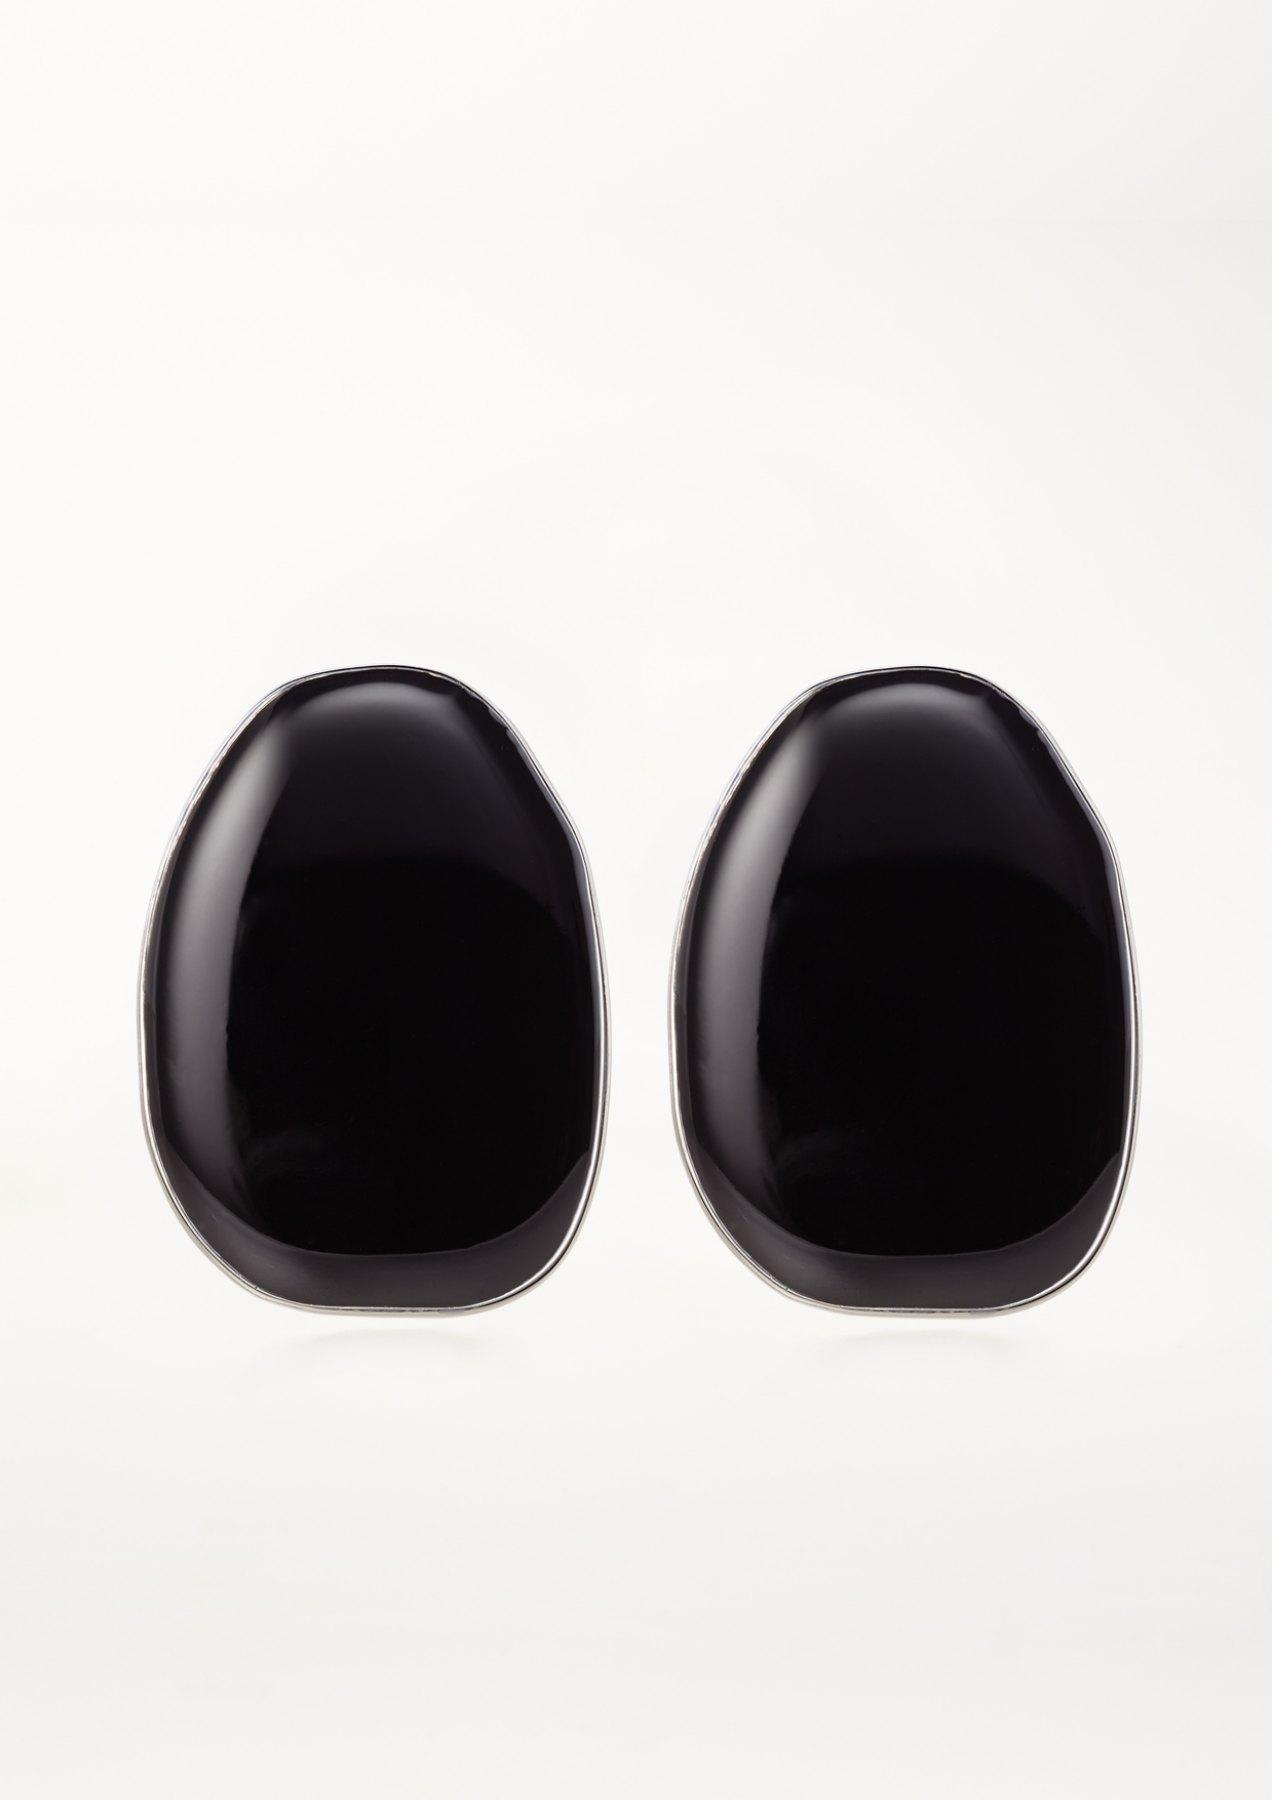 xenia bous jewellery coloured stone 01 earrings schwarz black